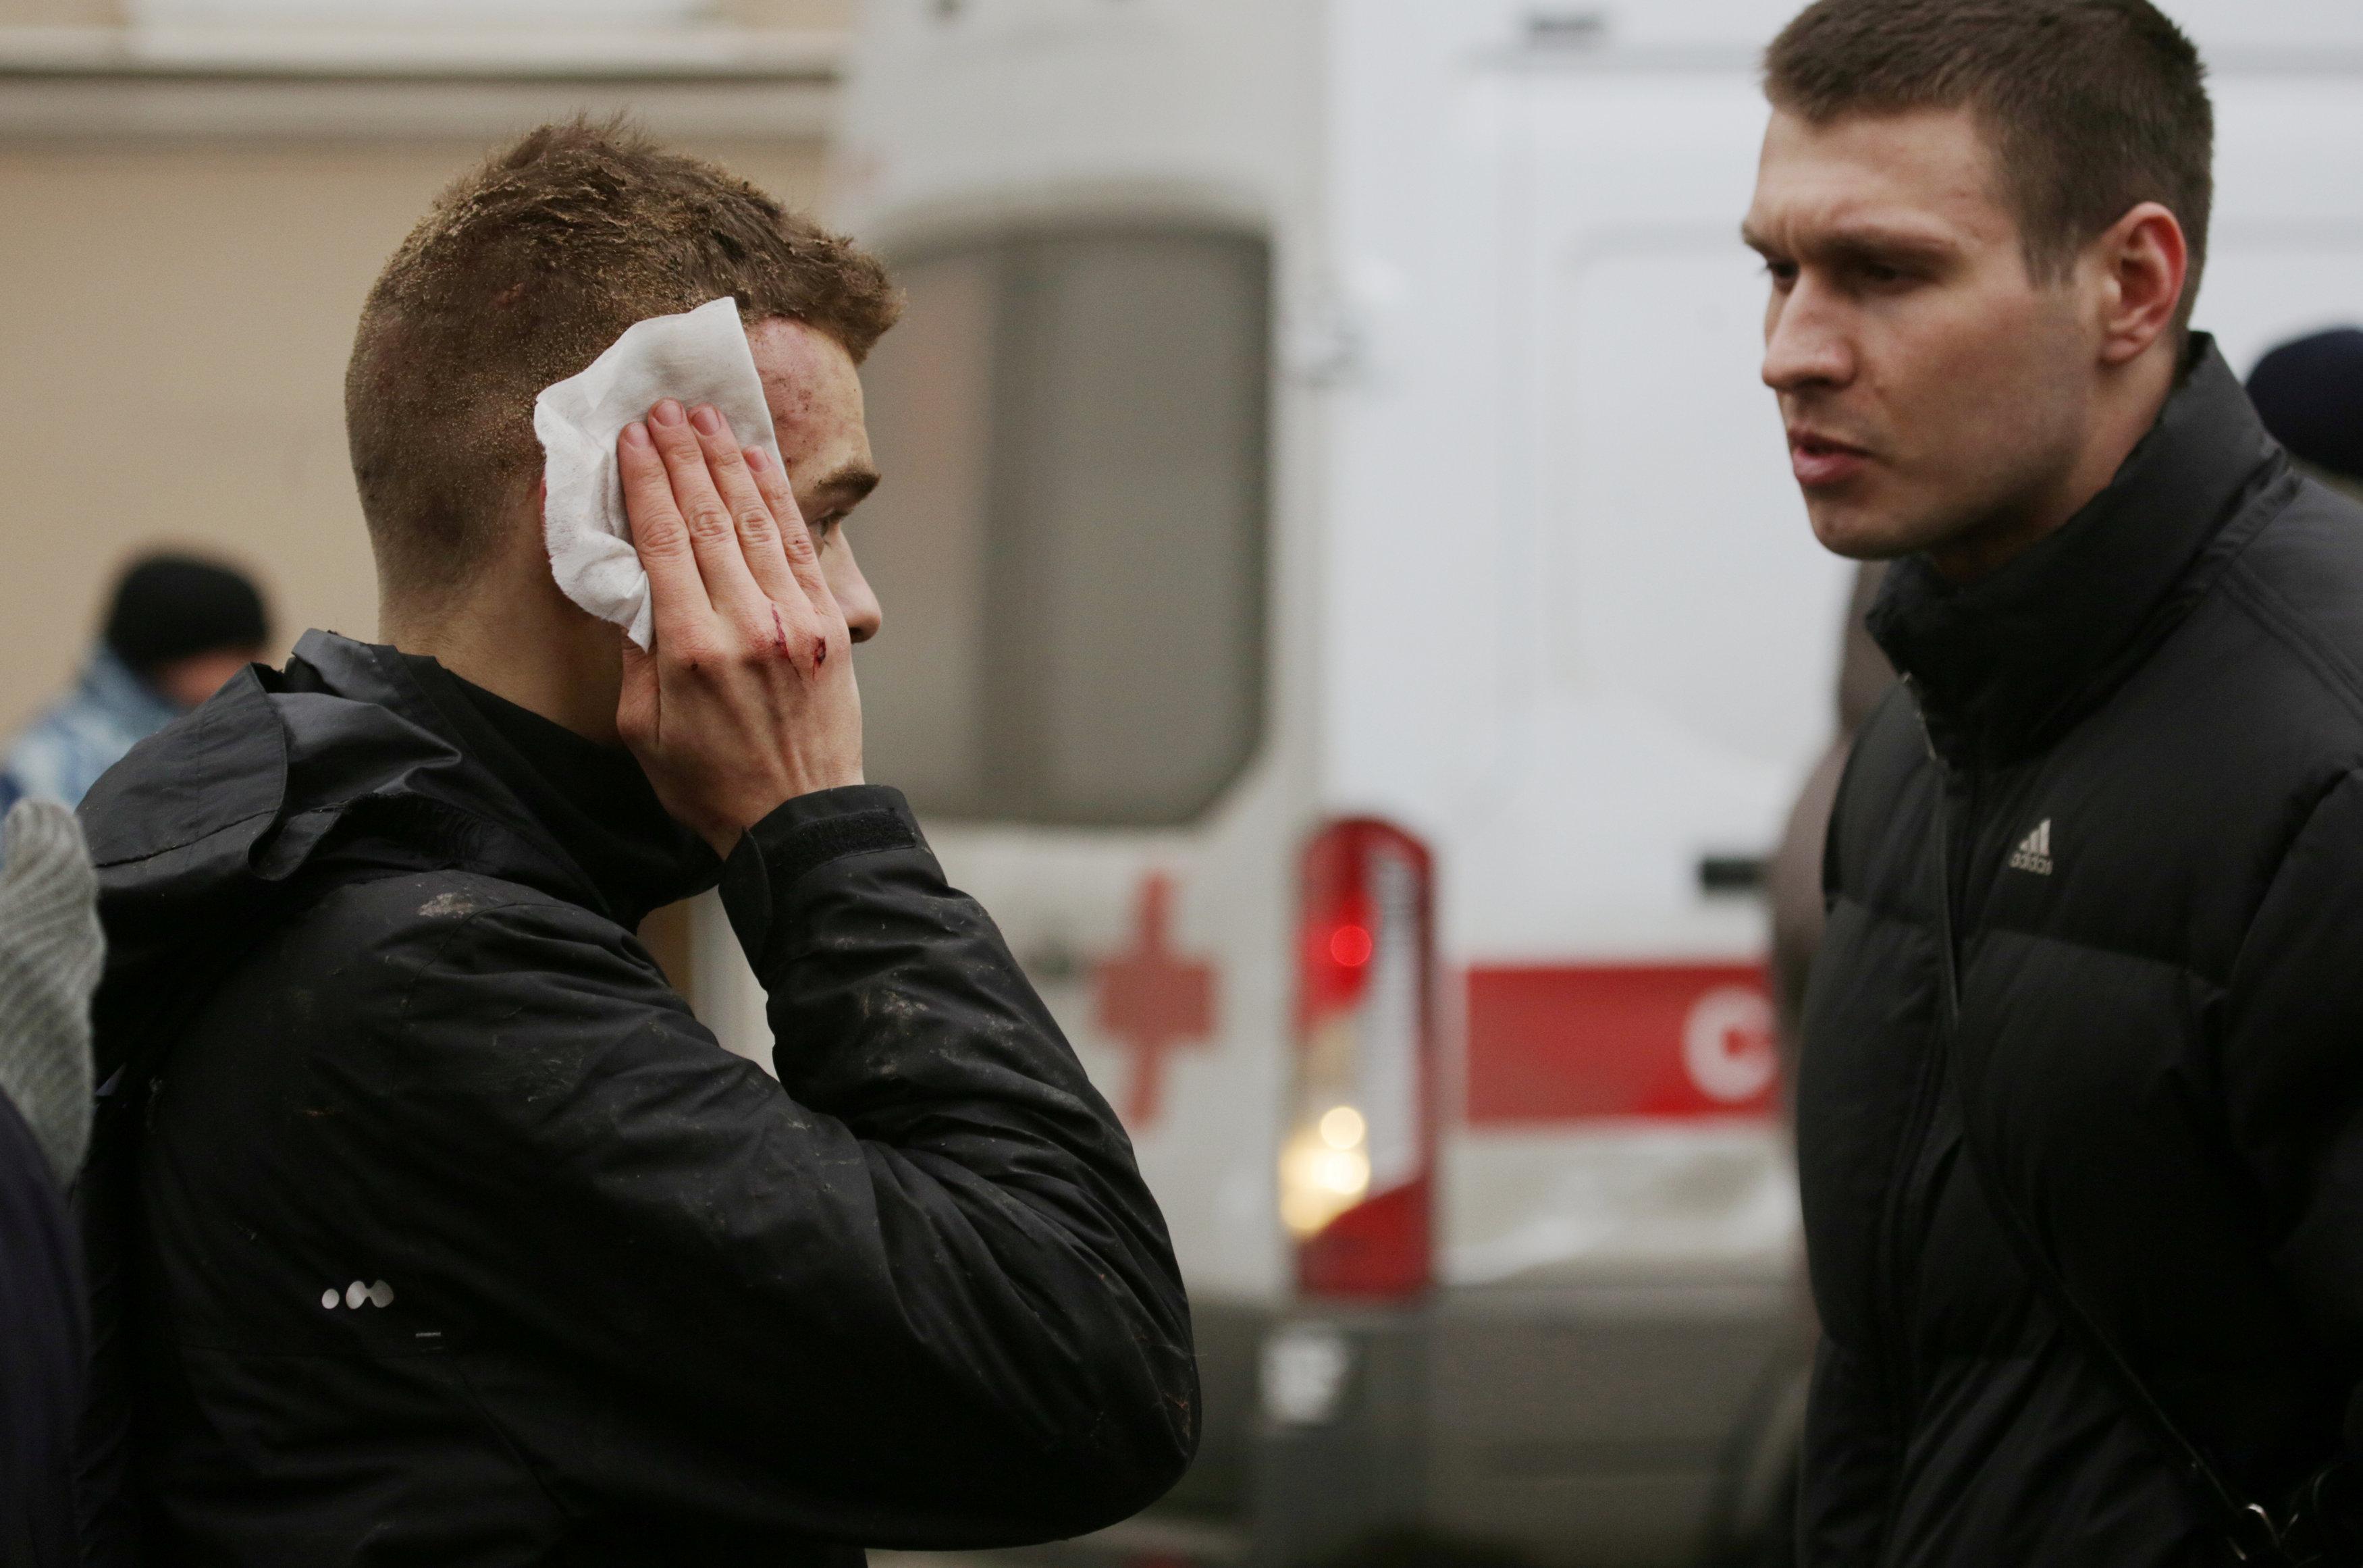 An injured person stands outside Sennaya Ploshchad metro station, following explosions in two train carriages at metro stations in St. Petersburg. (REUTERS/Anton Vaganov)